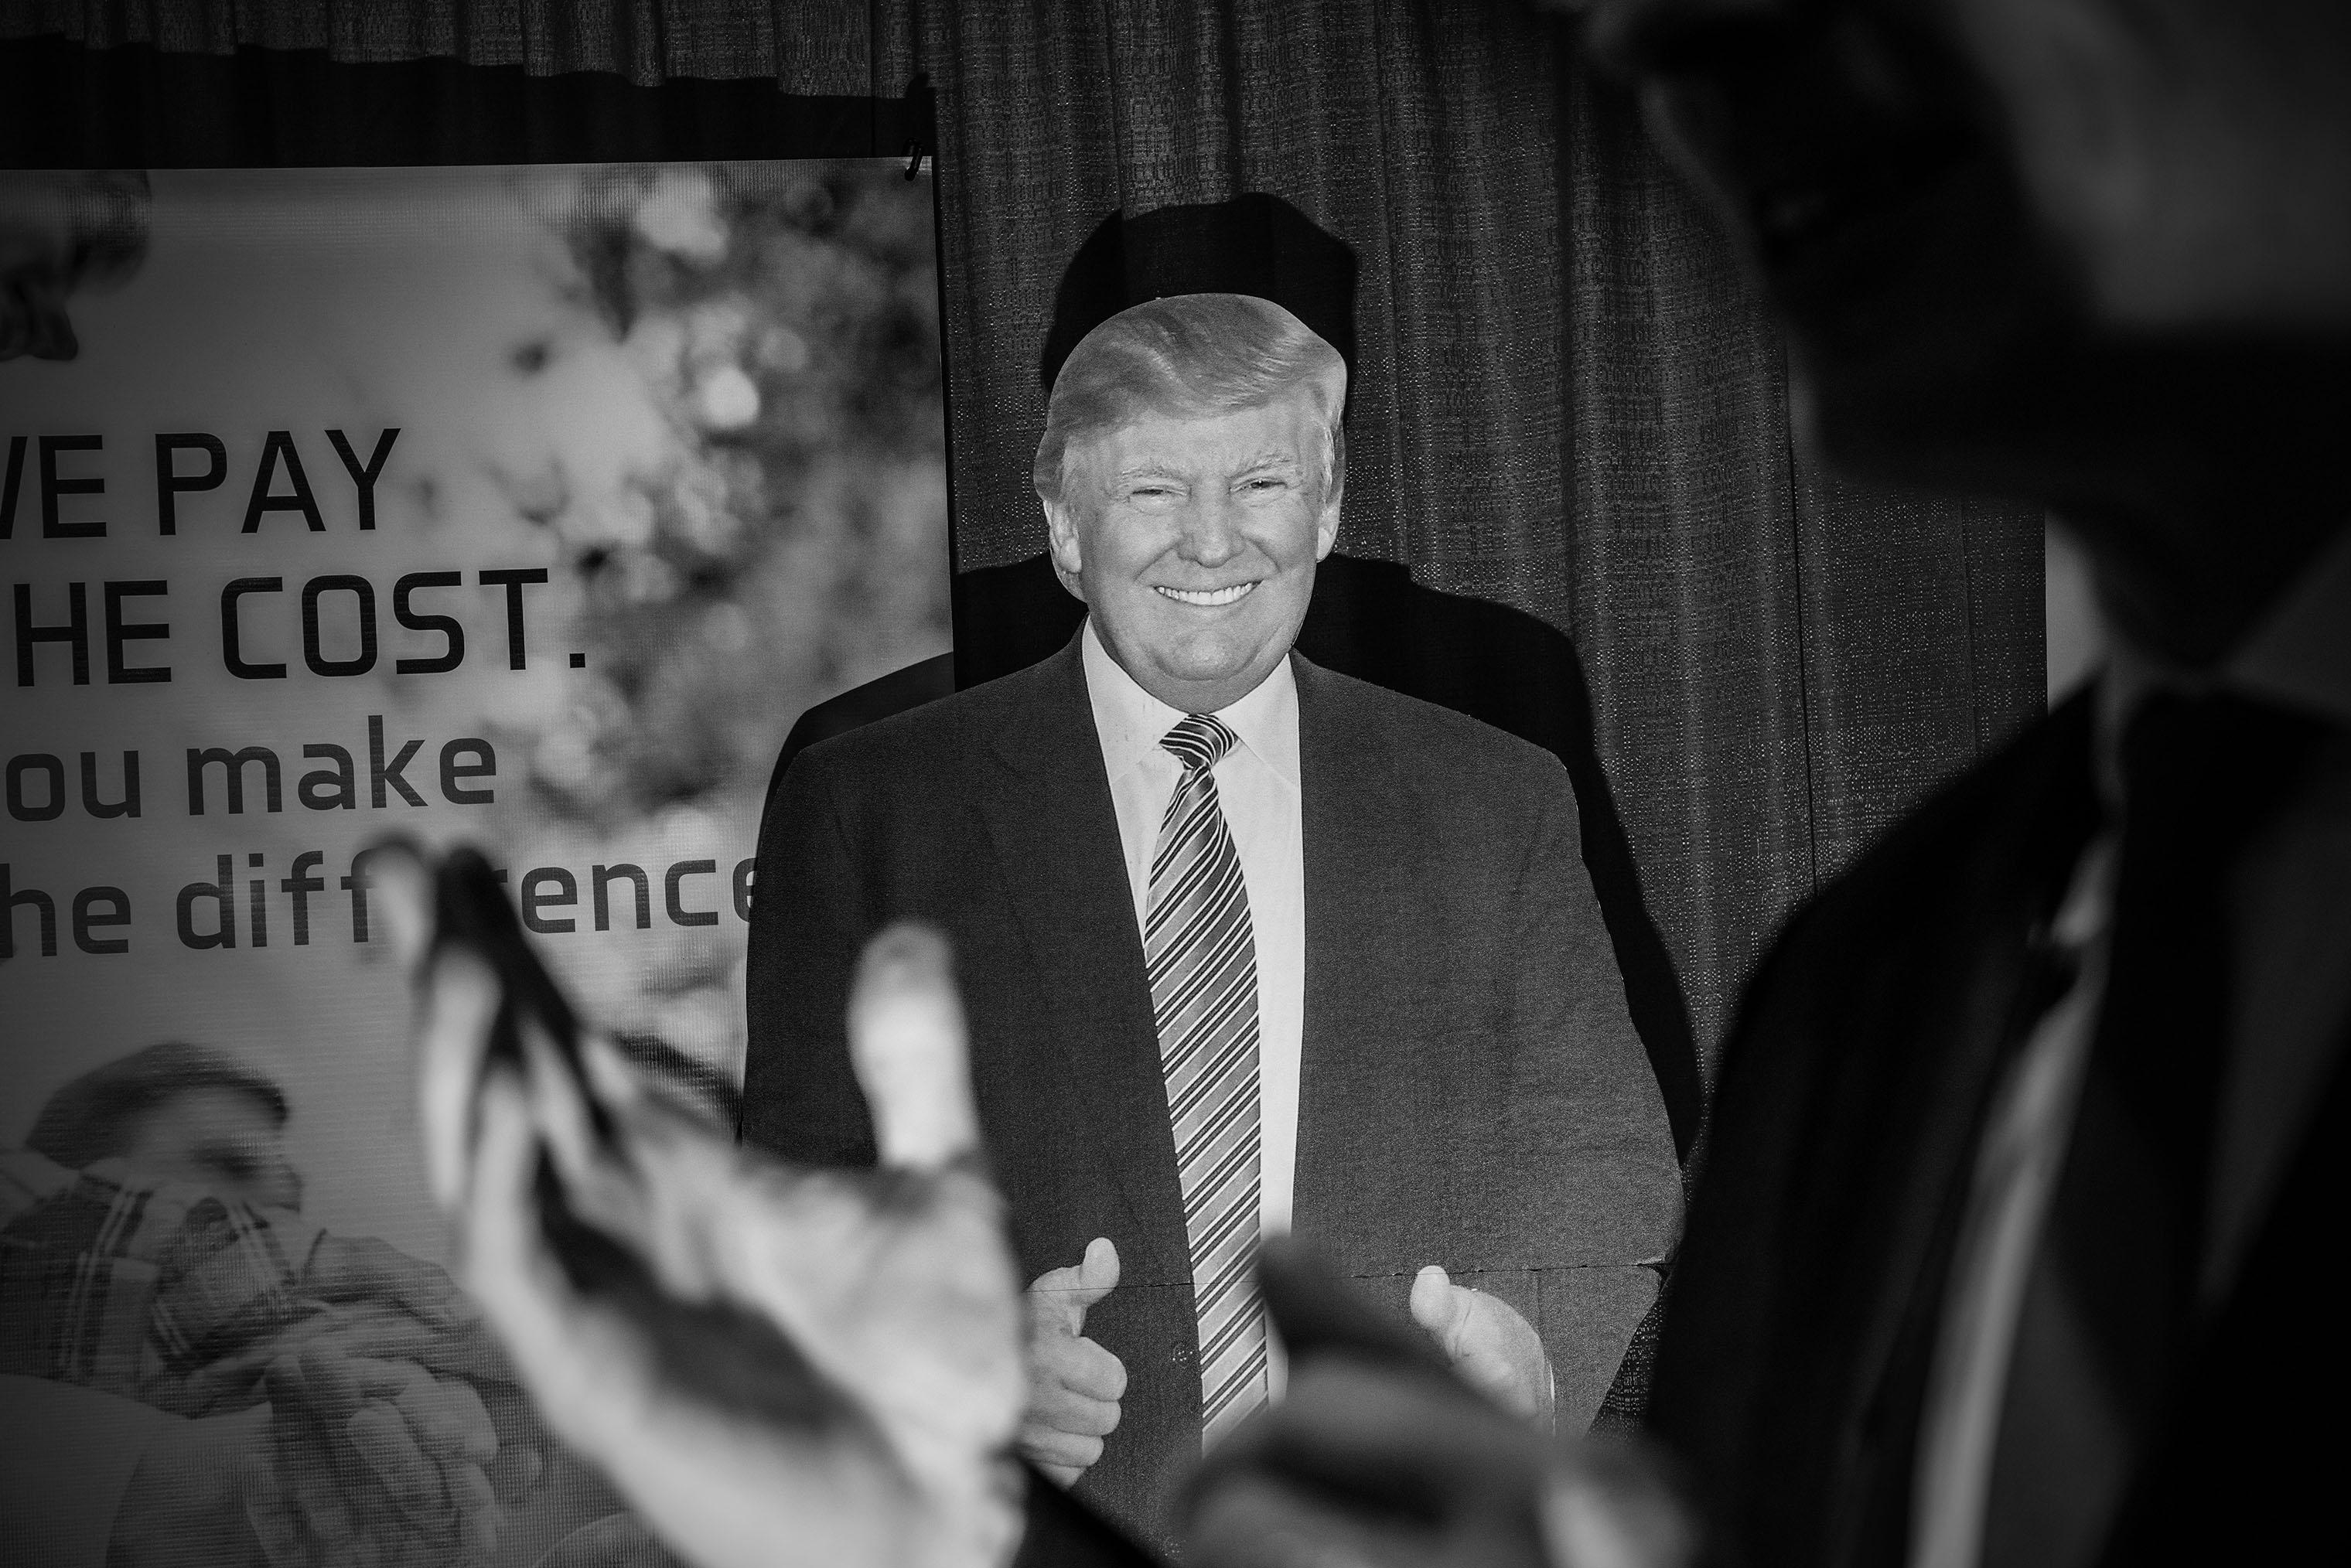 Cutout of President Donald Trump at CPAC.